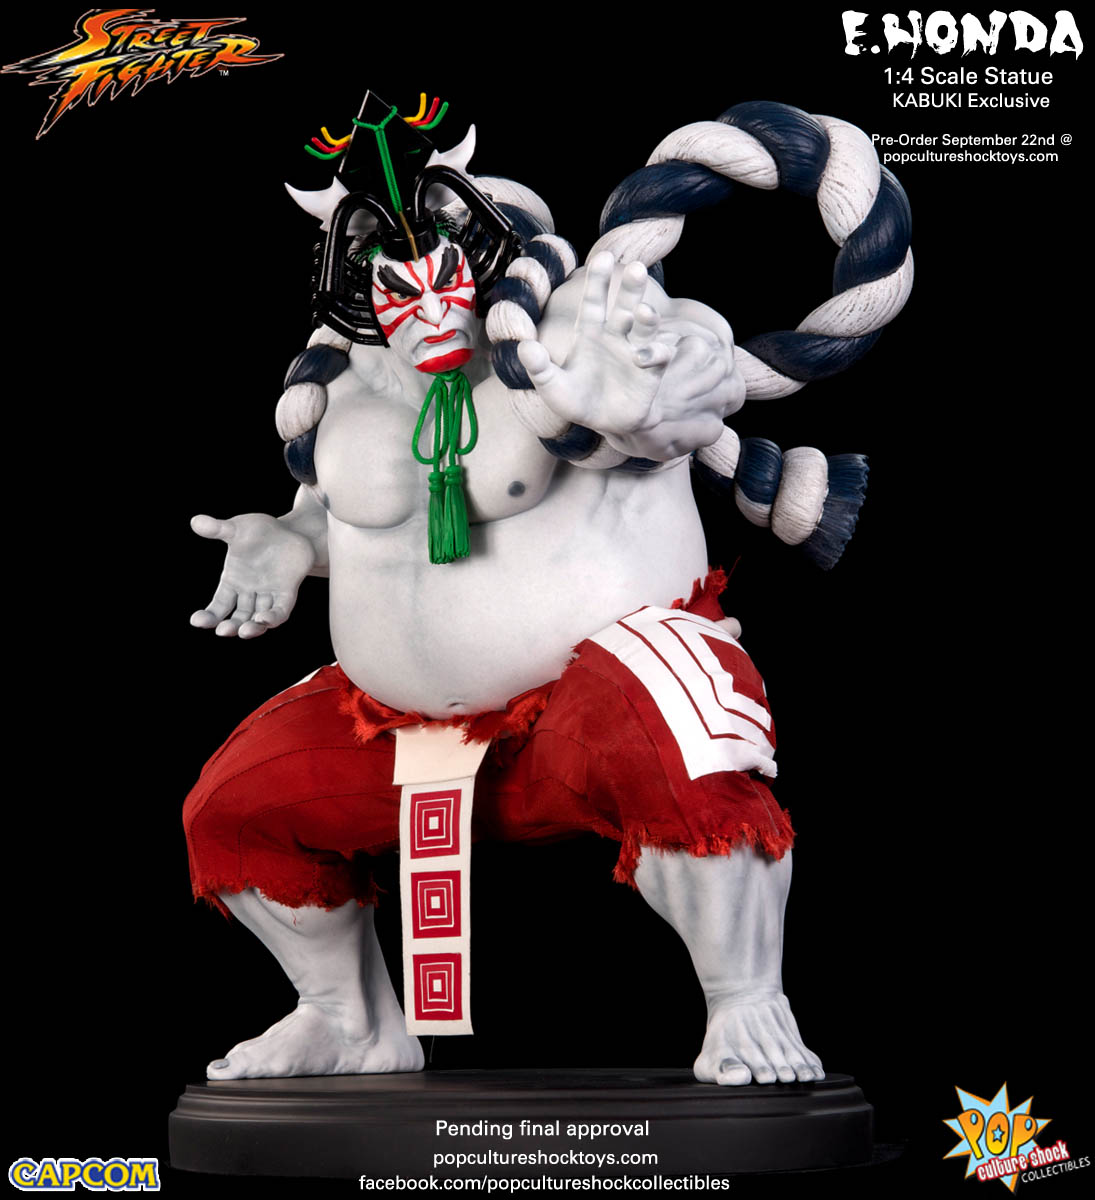 [Pop Culture Shock] Street Fighter: E. Honda 1/4 Statue - Página 3 Street-Fighter-E.-Honda-Kabuki-Statue-002